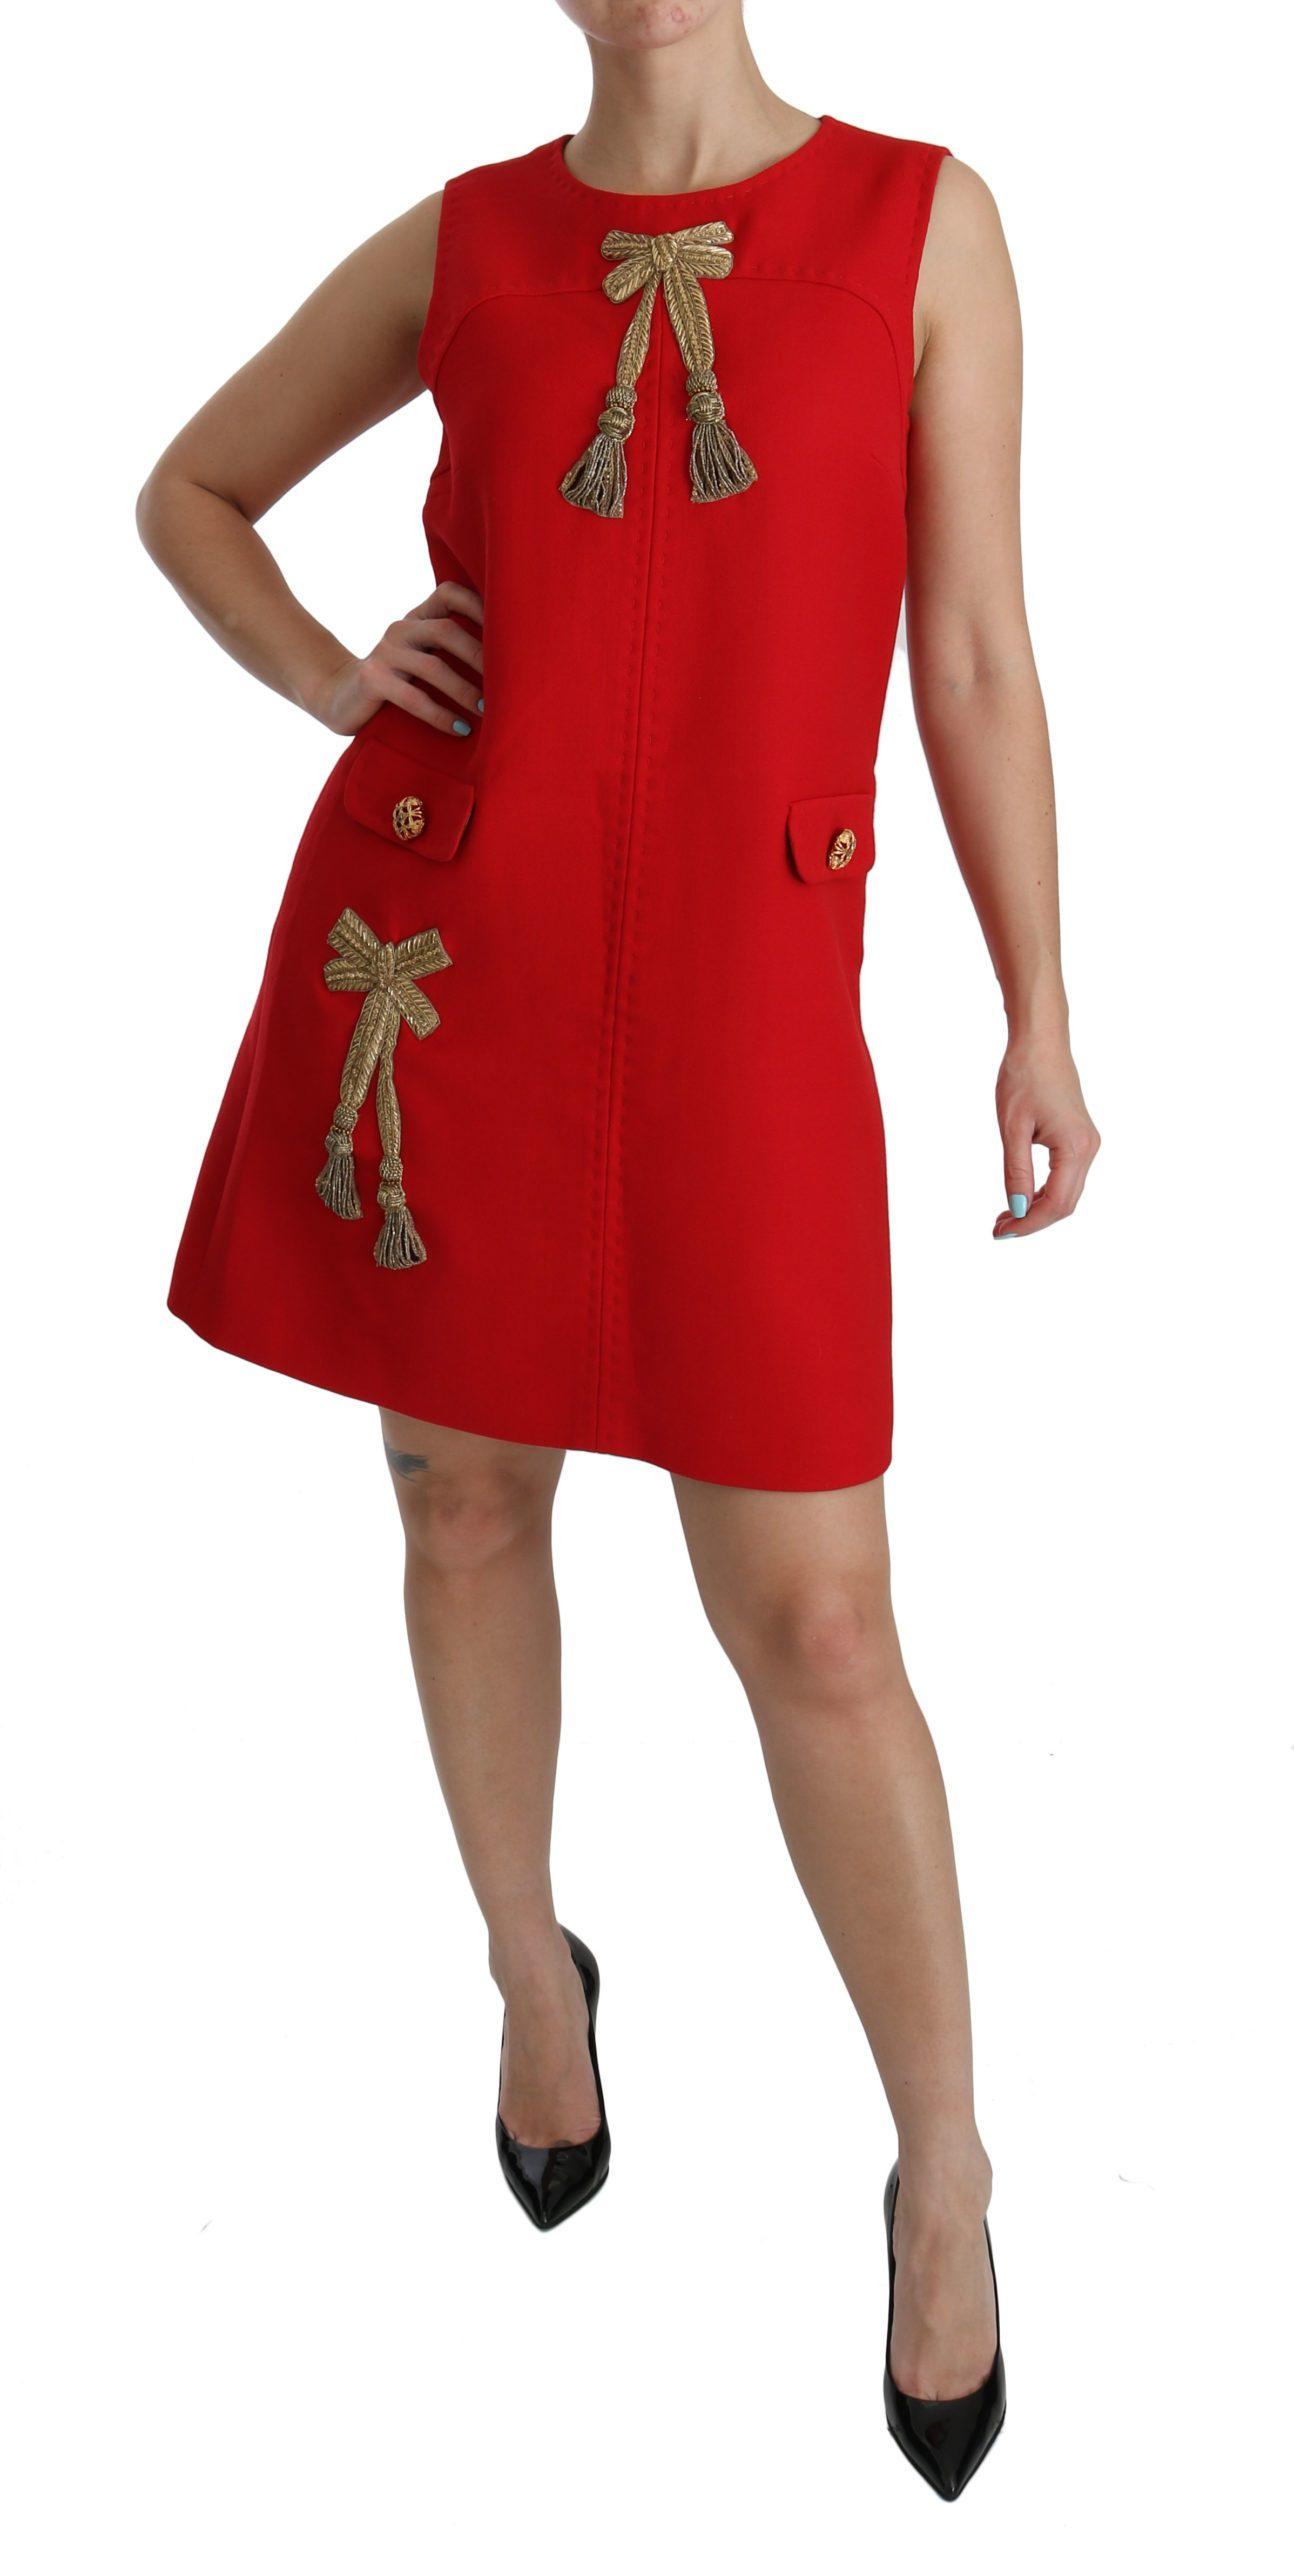 Dolce & Gabbana Women's Sheath Tassel Sleeveless Mini Dress Red DR2076 - IT46|XL